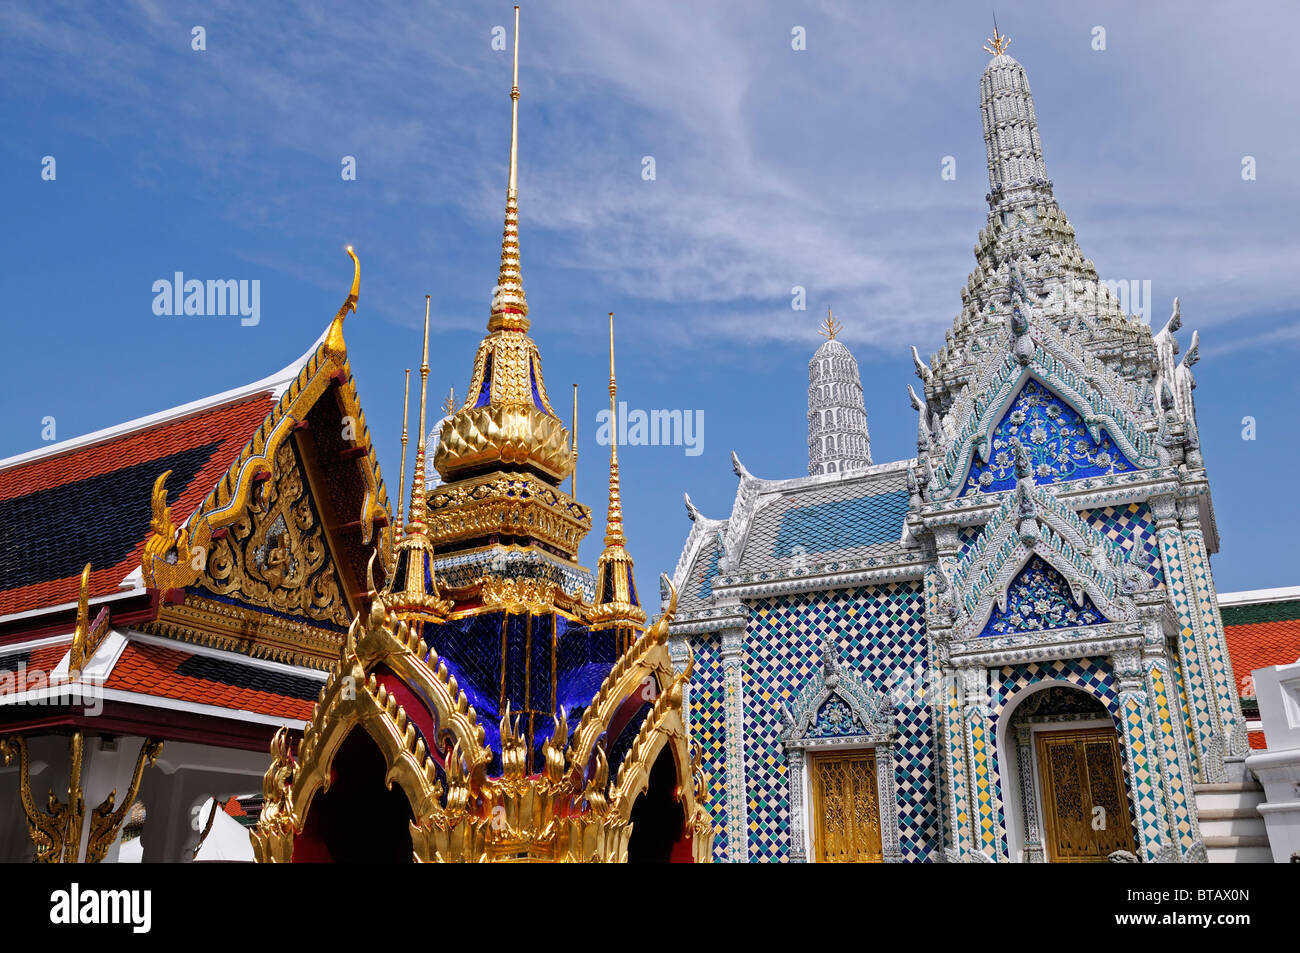 Le Grand Palace Bangkok Thaïlande Wat Phra Kaew Temple du Bouddha Émeraude Pierres Sema Sema Bai Double Banque D'Images